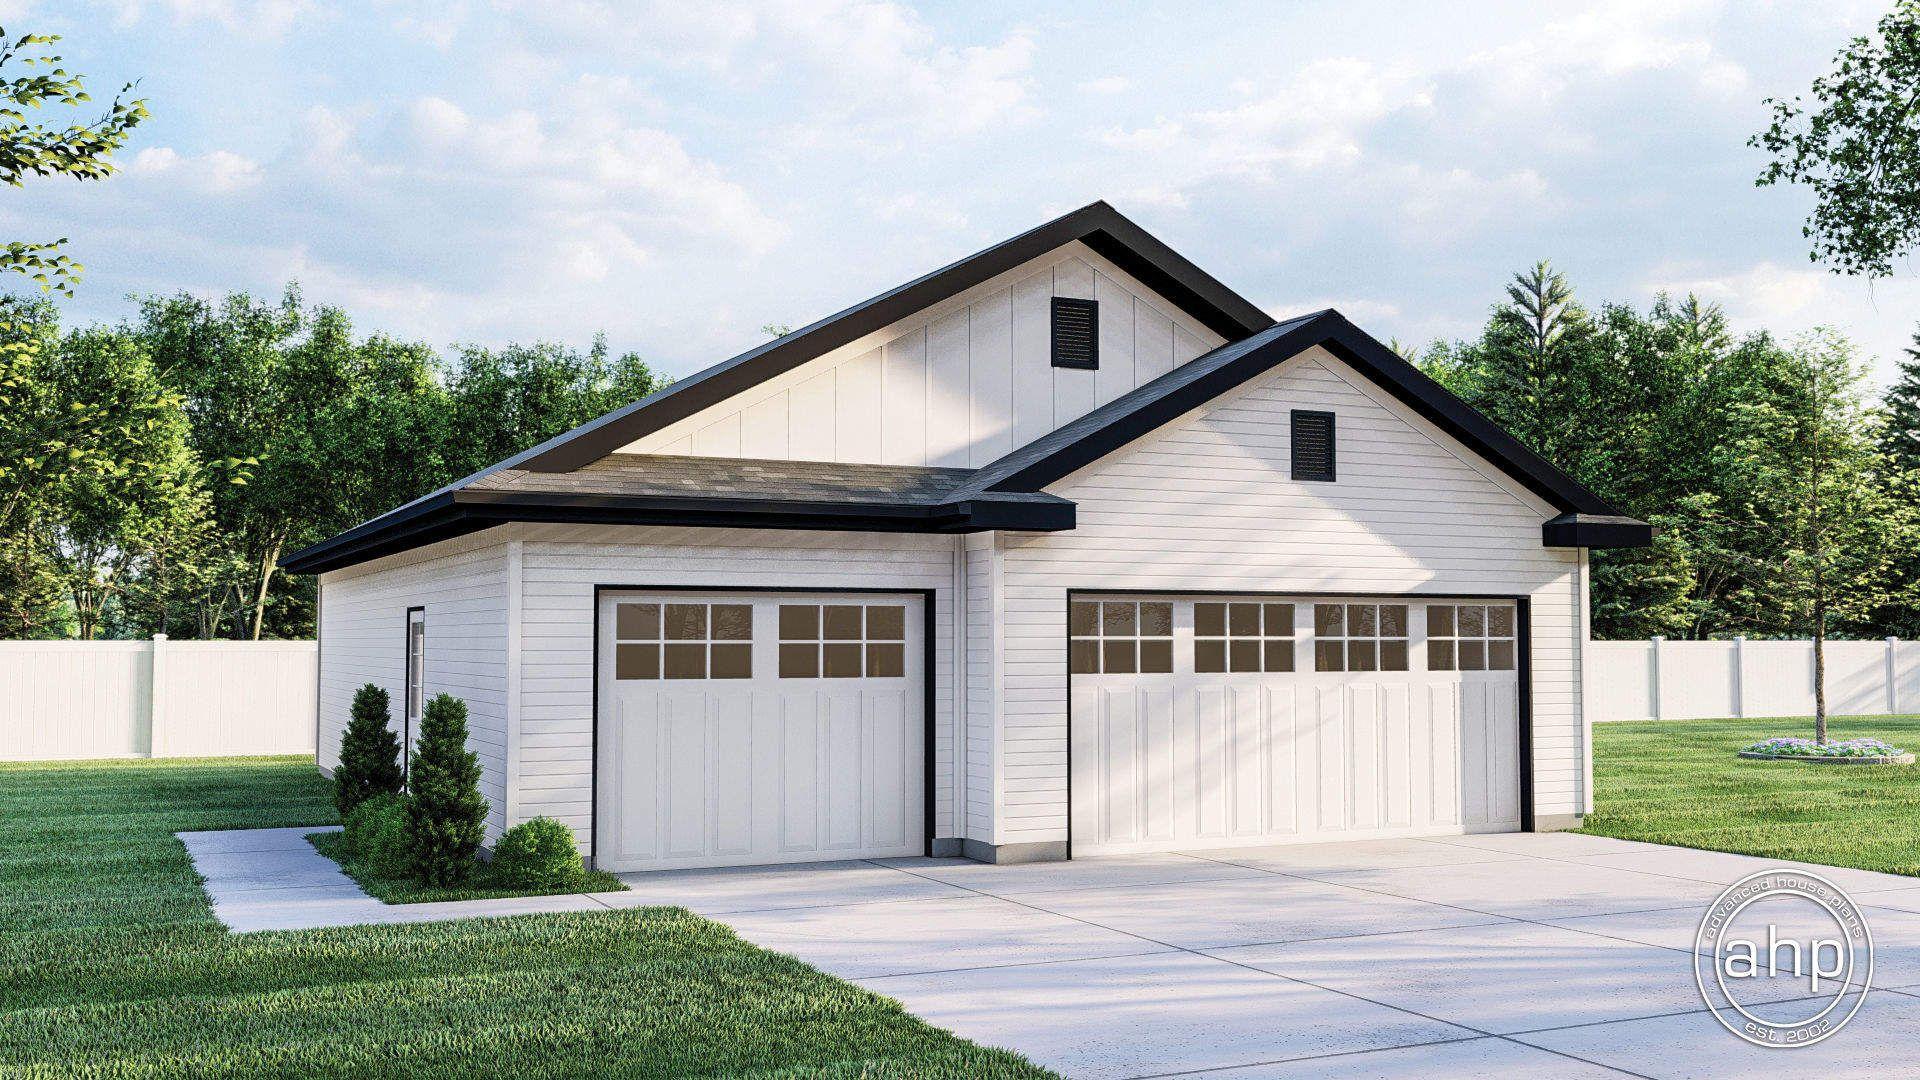 3 Car Garage Plan Randall In 2021 Backyard Garage Garage Exterior Garage Plans Detached